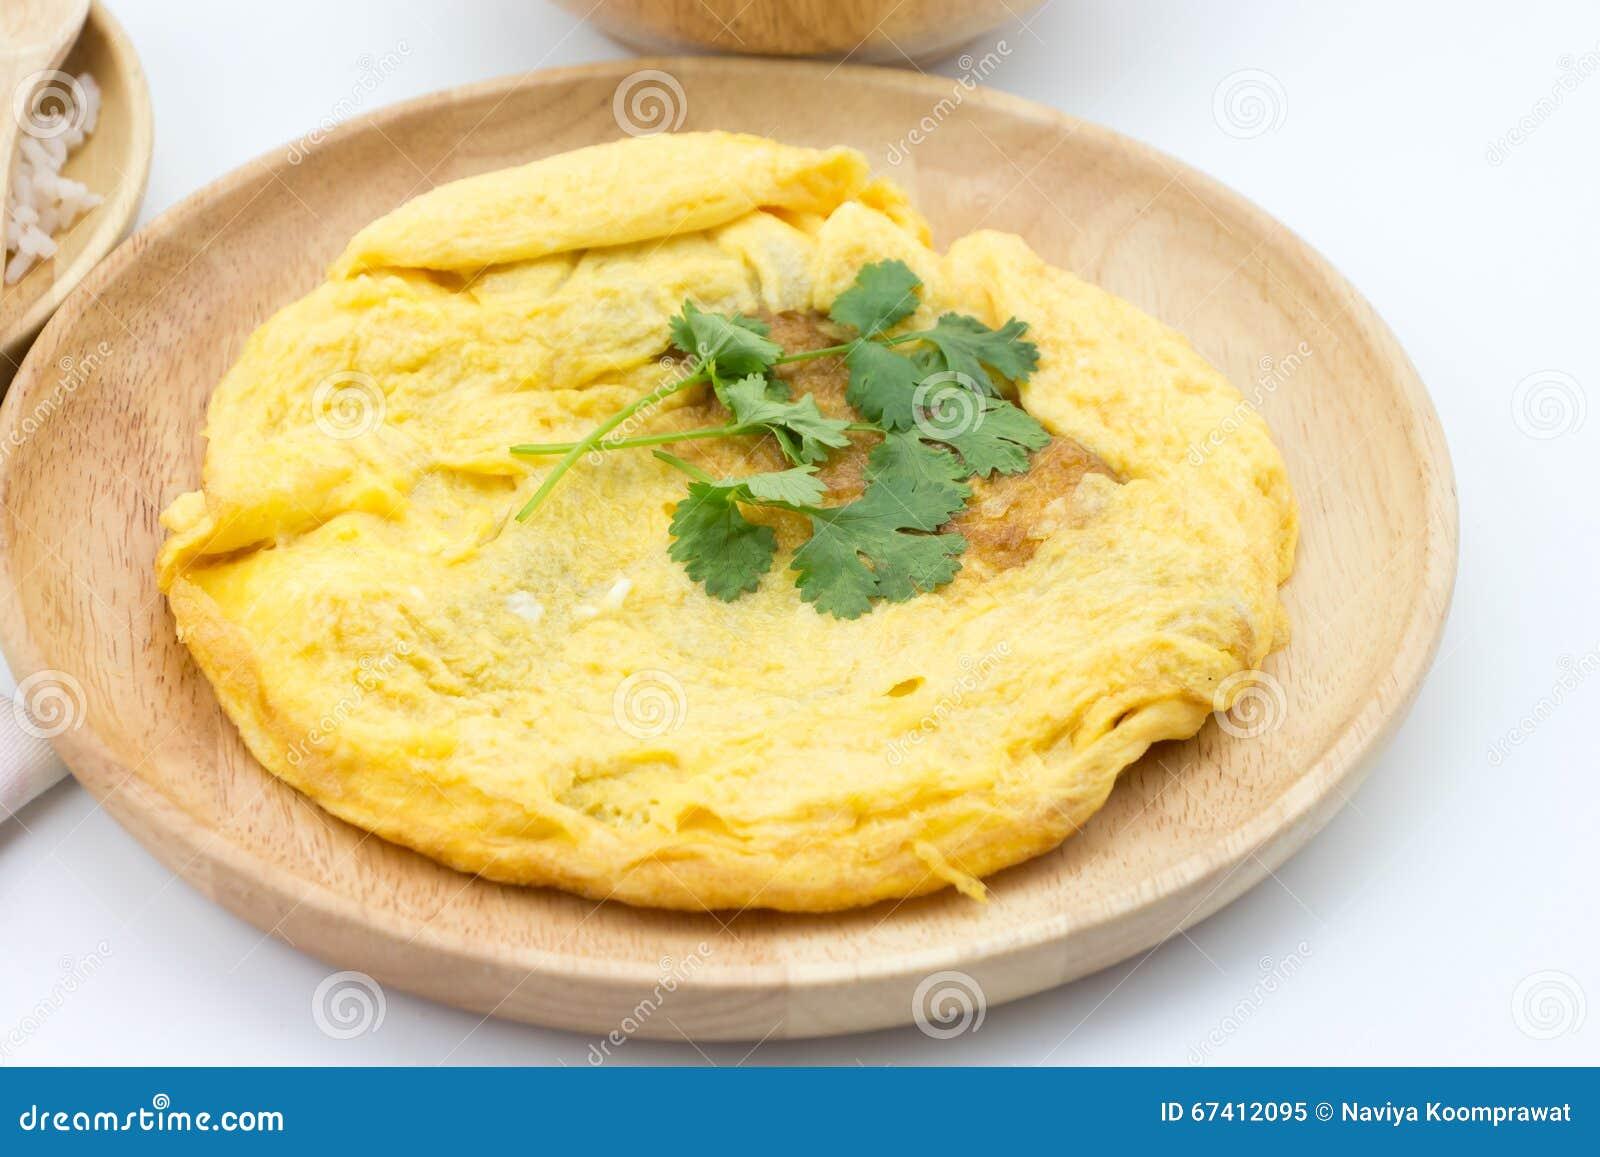 Omlet tajlandzki